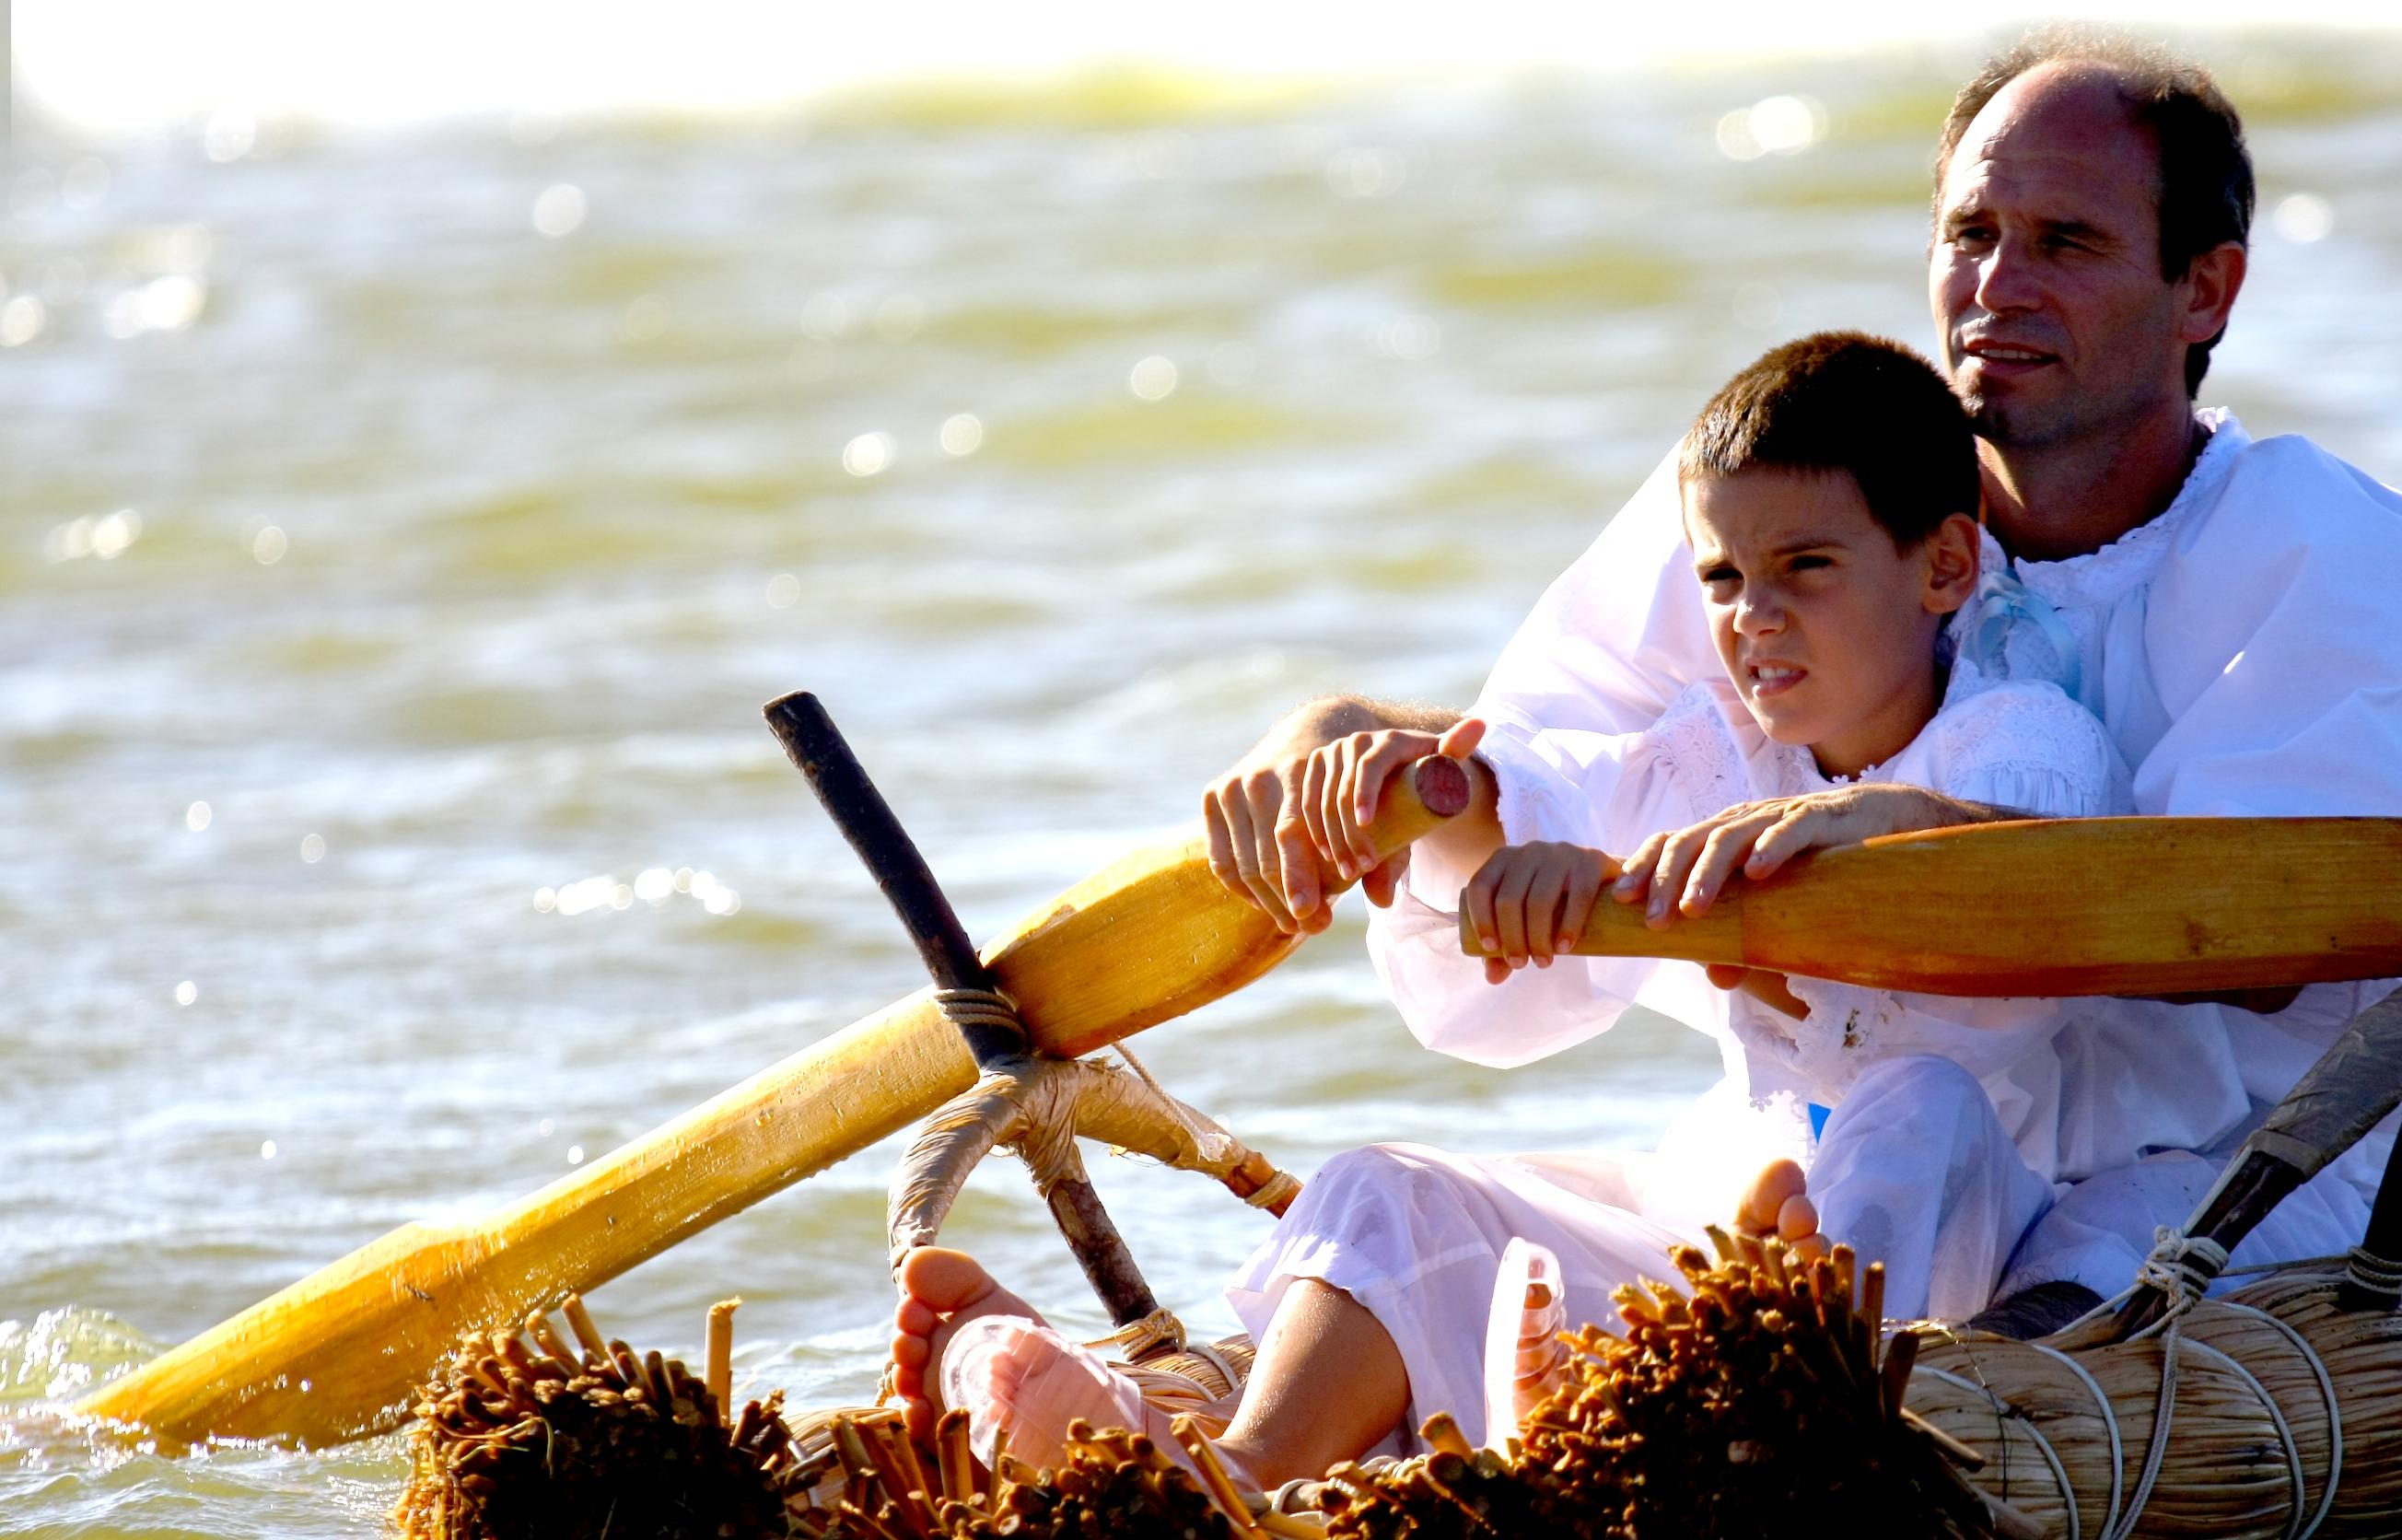 Laguna di Santa Giusta 29-30-31 agosto 2014 Is Fassois